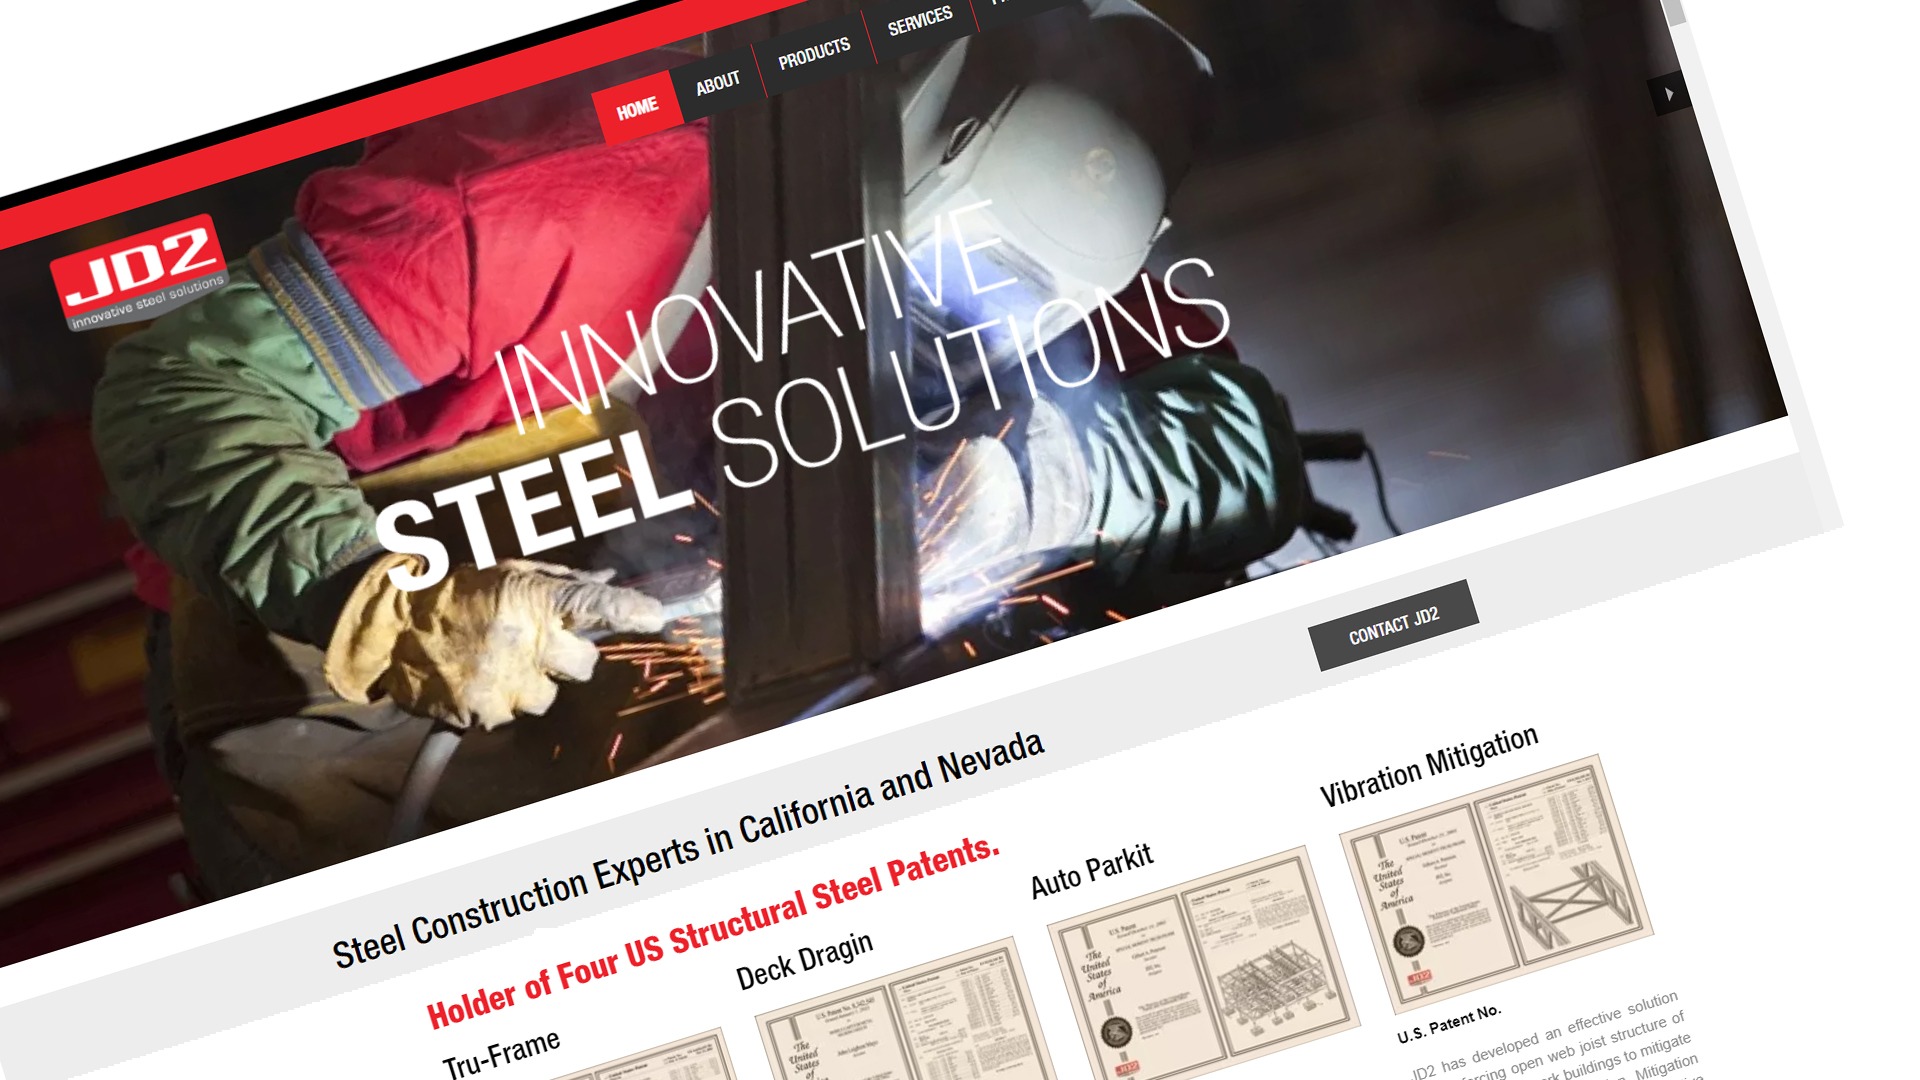 JD2 Steel Solutions